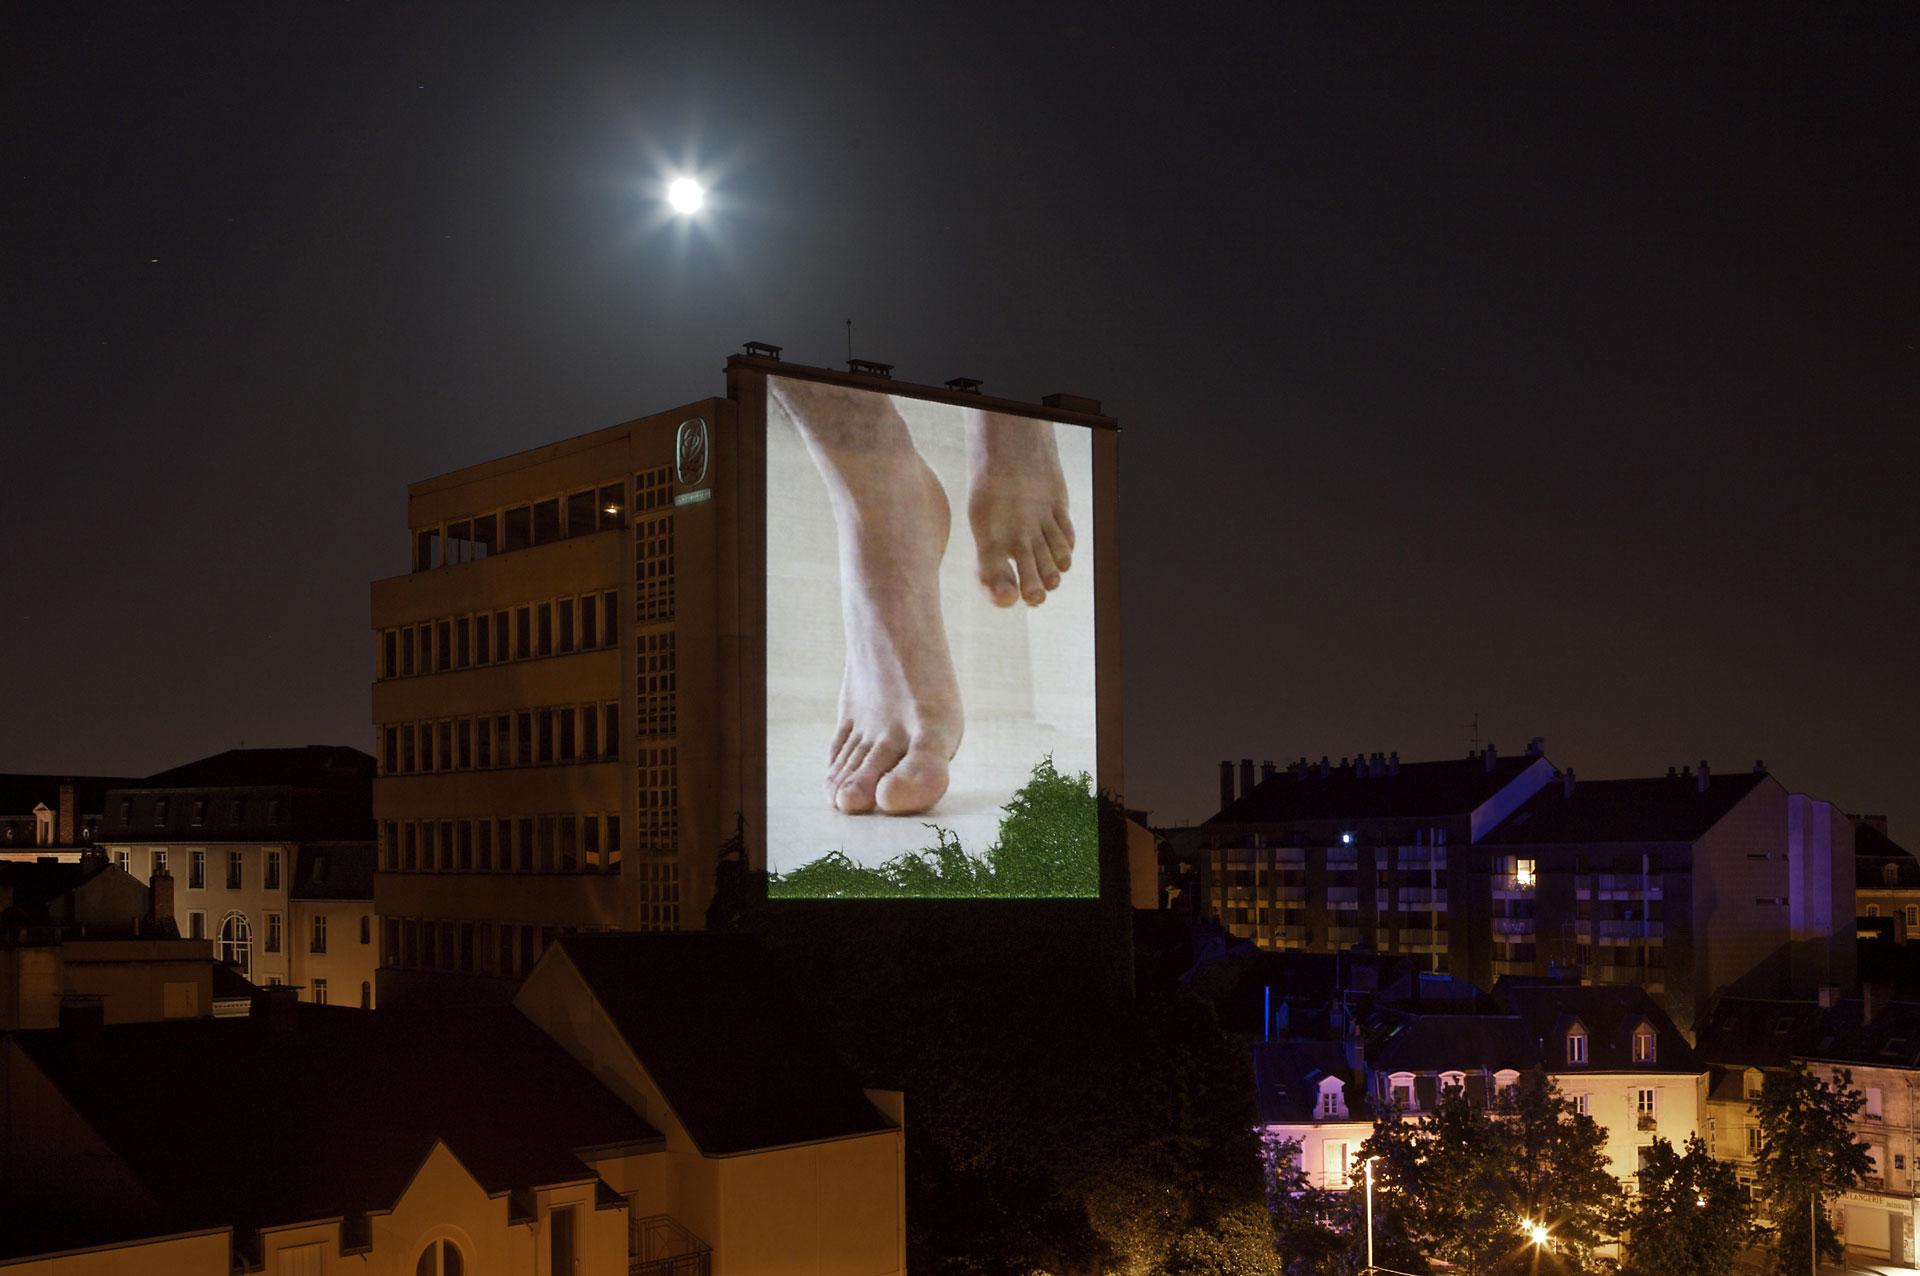 Watching my feet (2006)